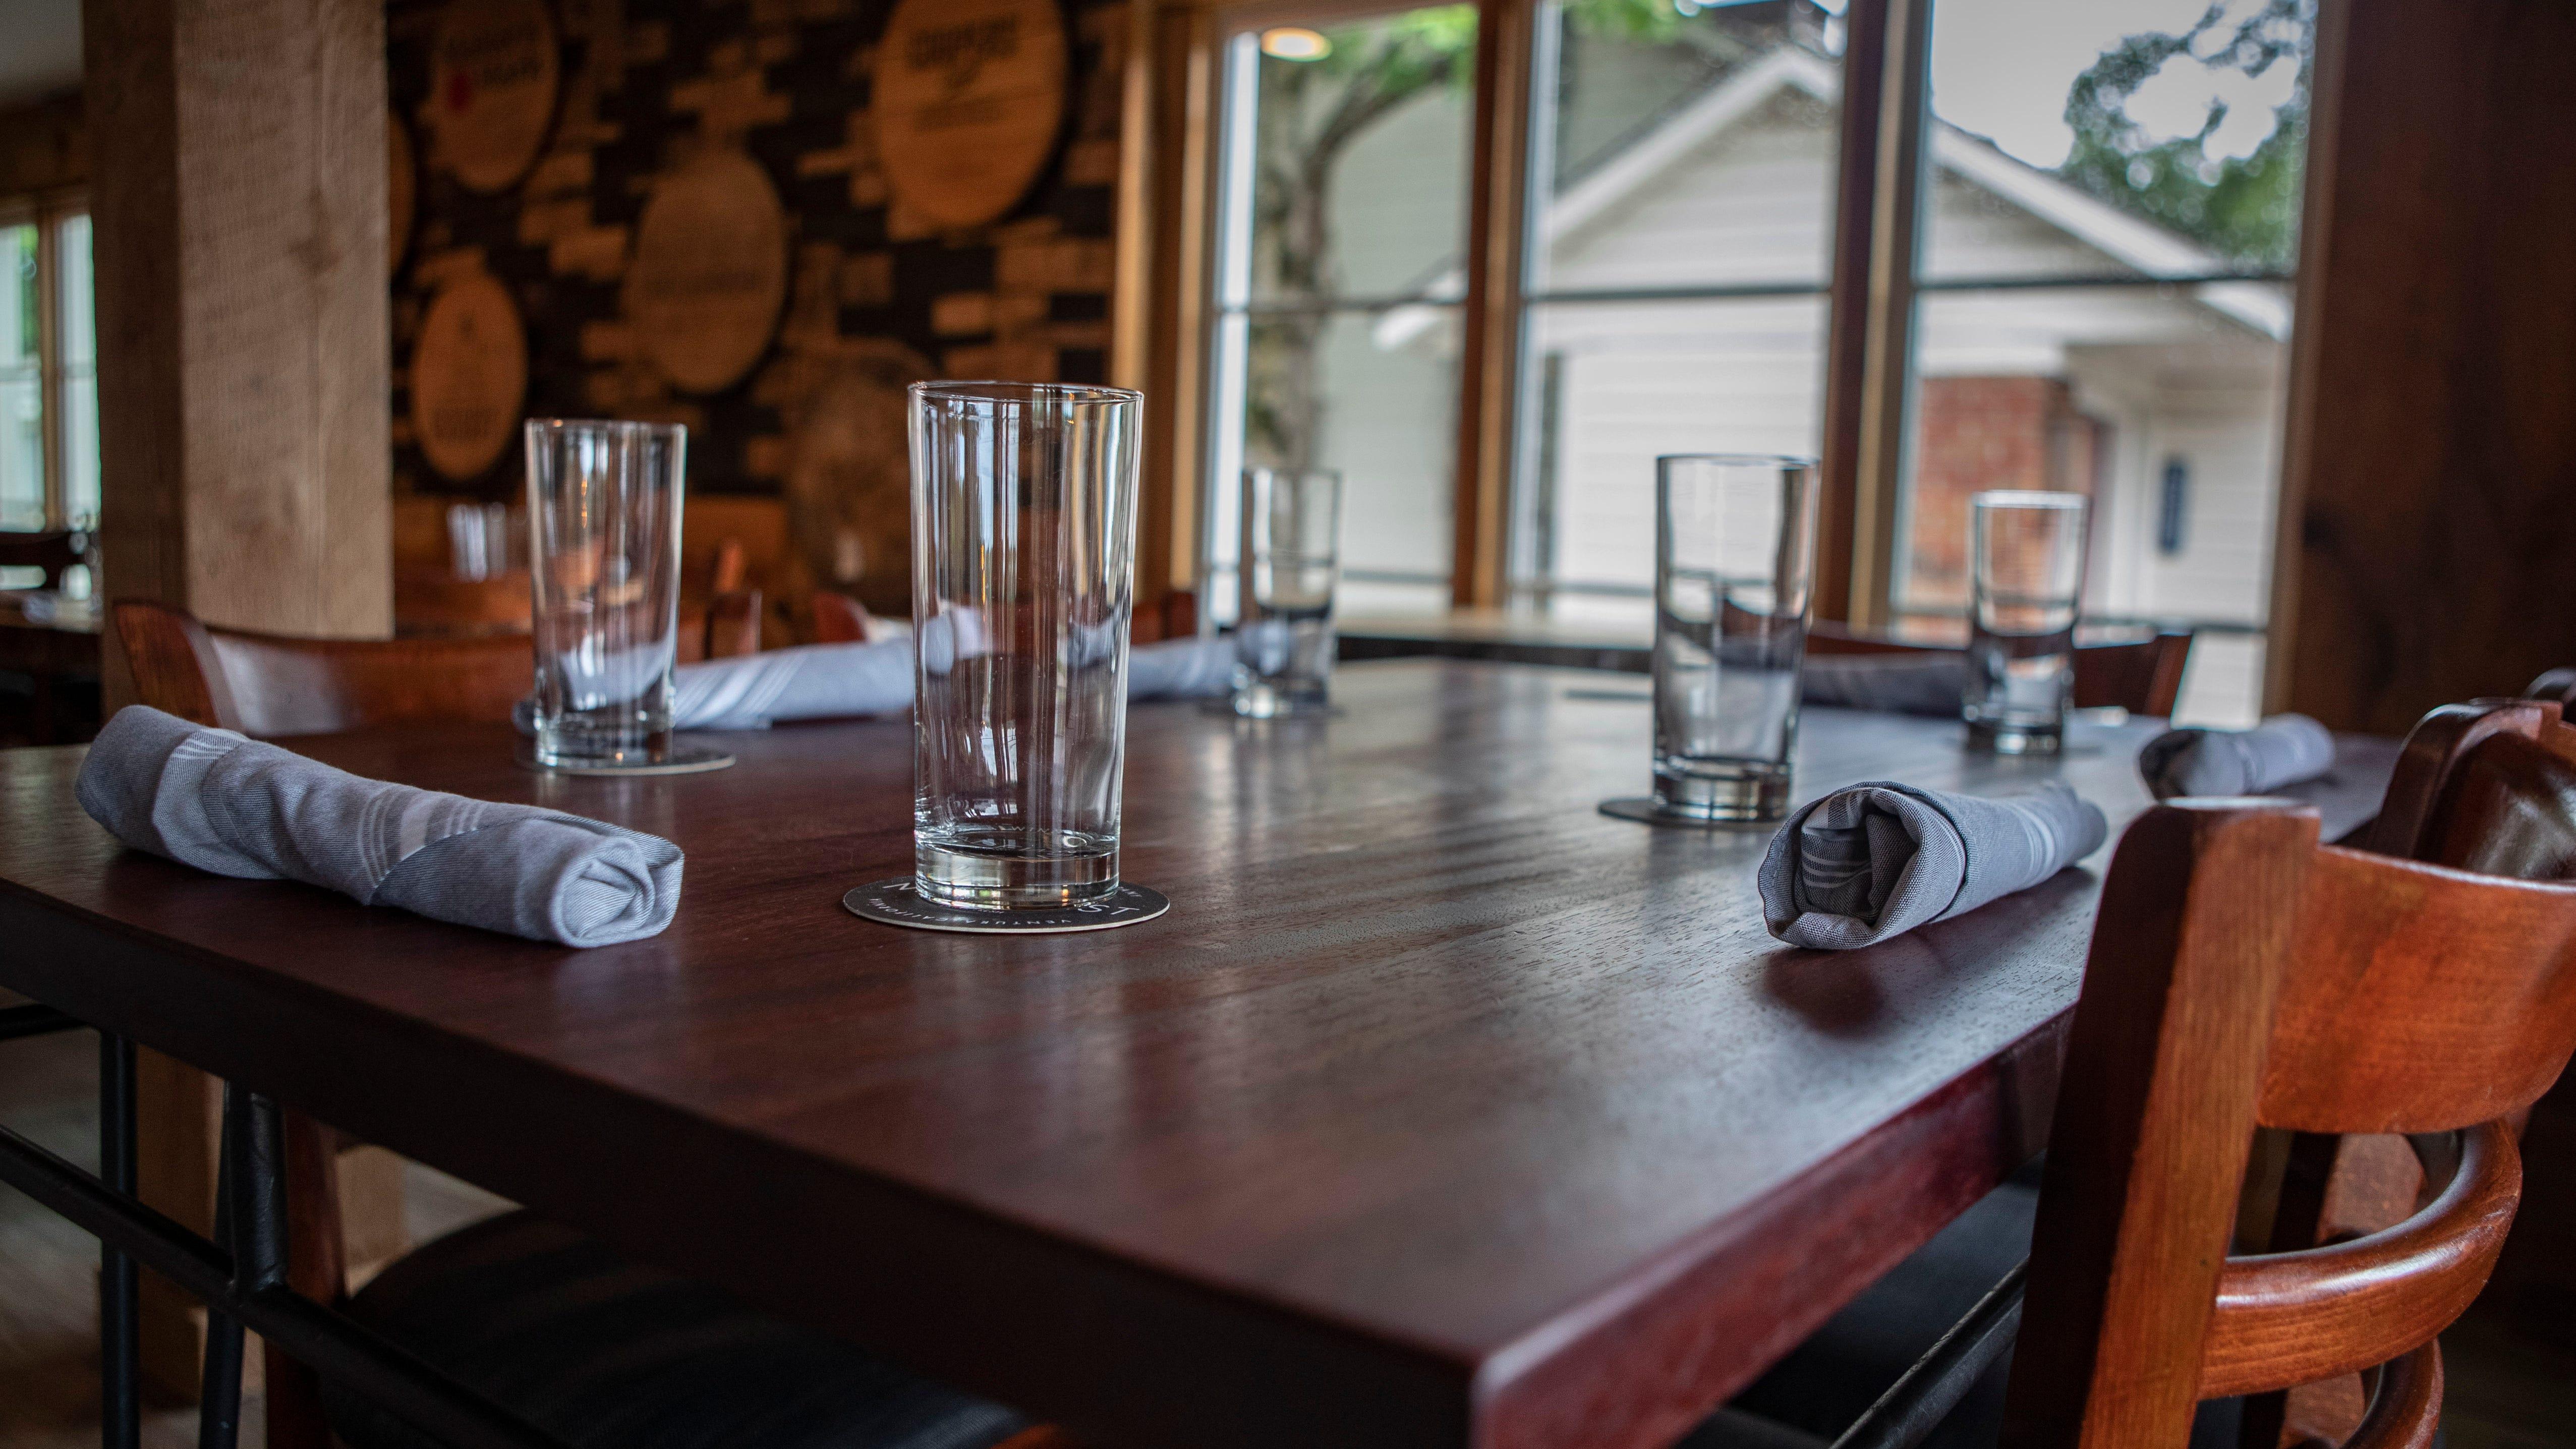 Memphis restaurants want better communication from Health Dept.